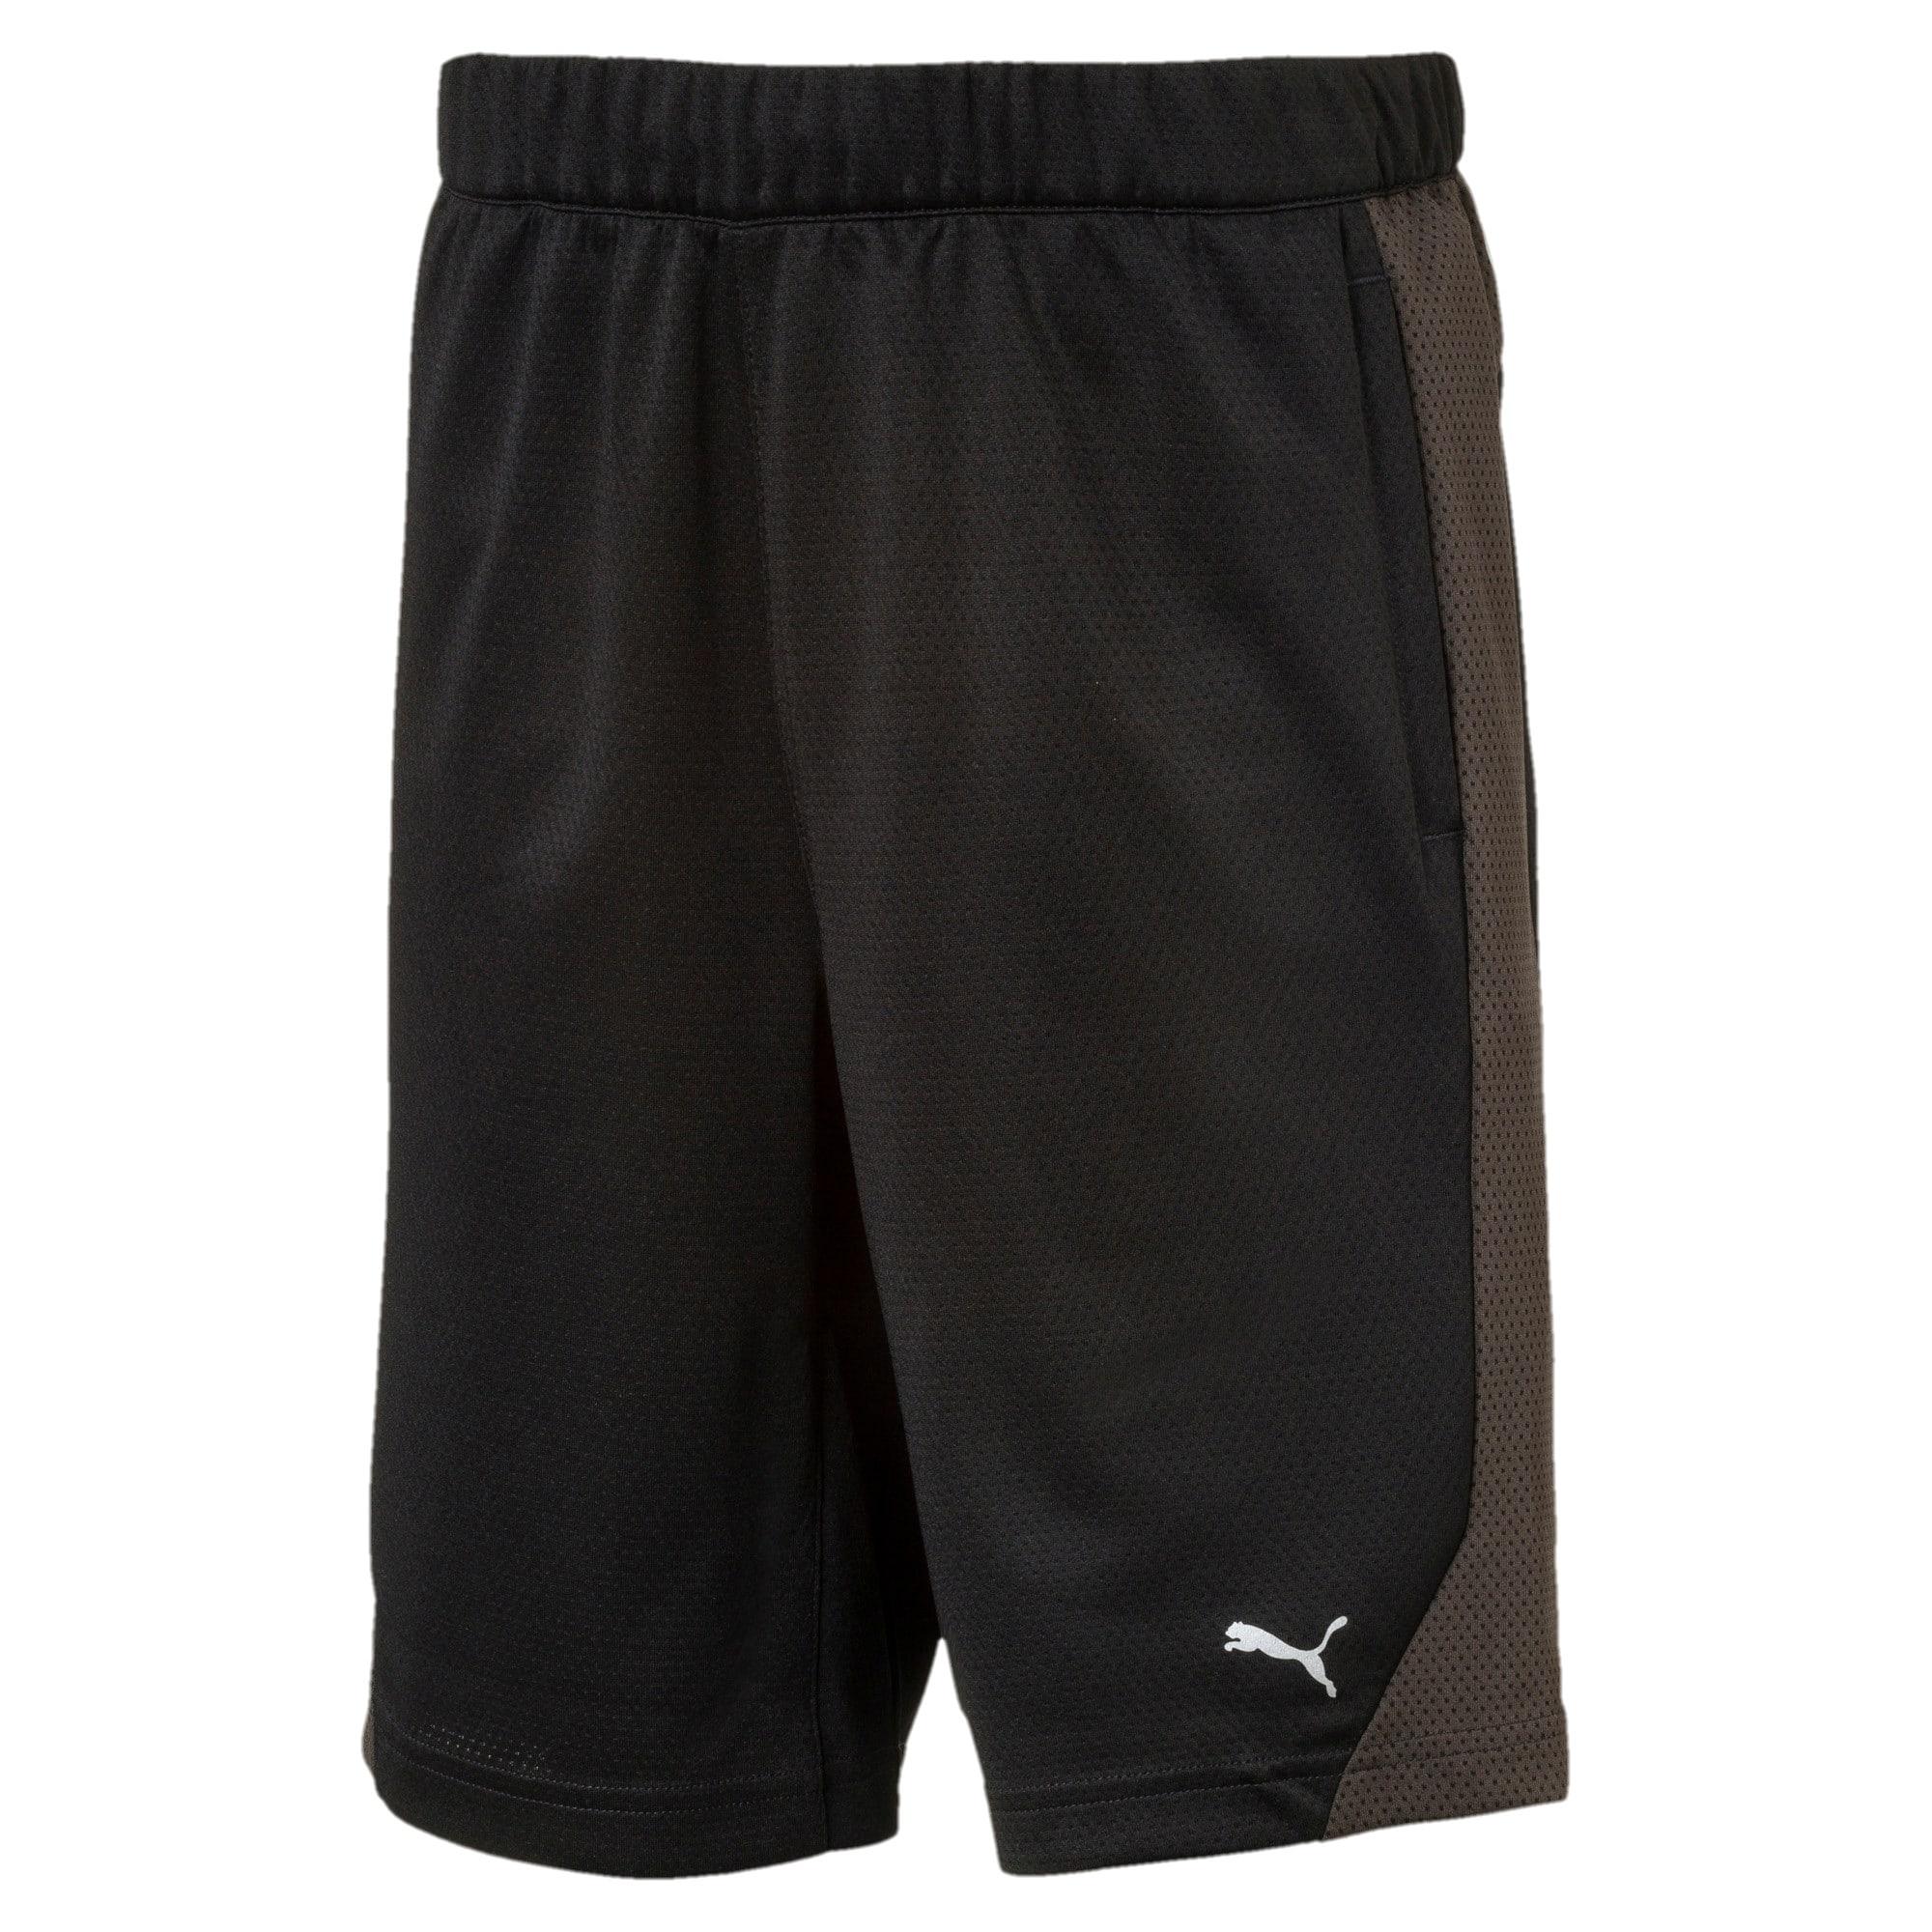 Thumbnail 1 of Boys' Gym Shorts, Puma Black, medium-IND